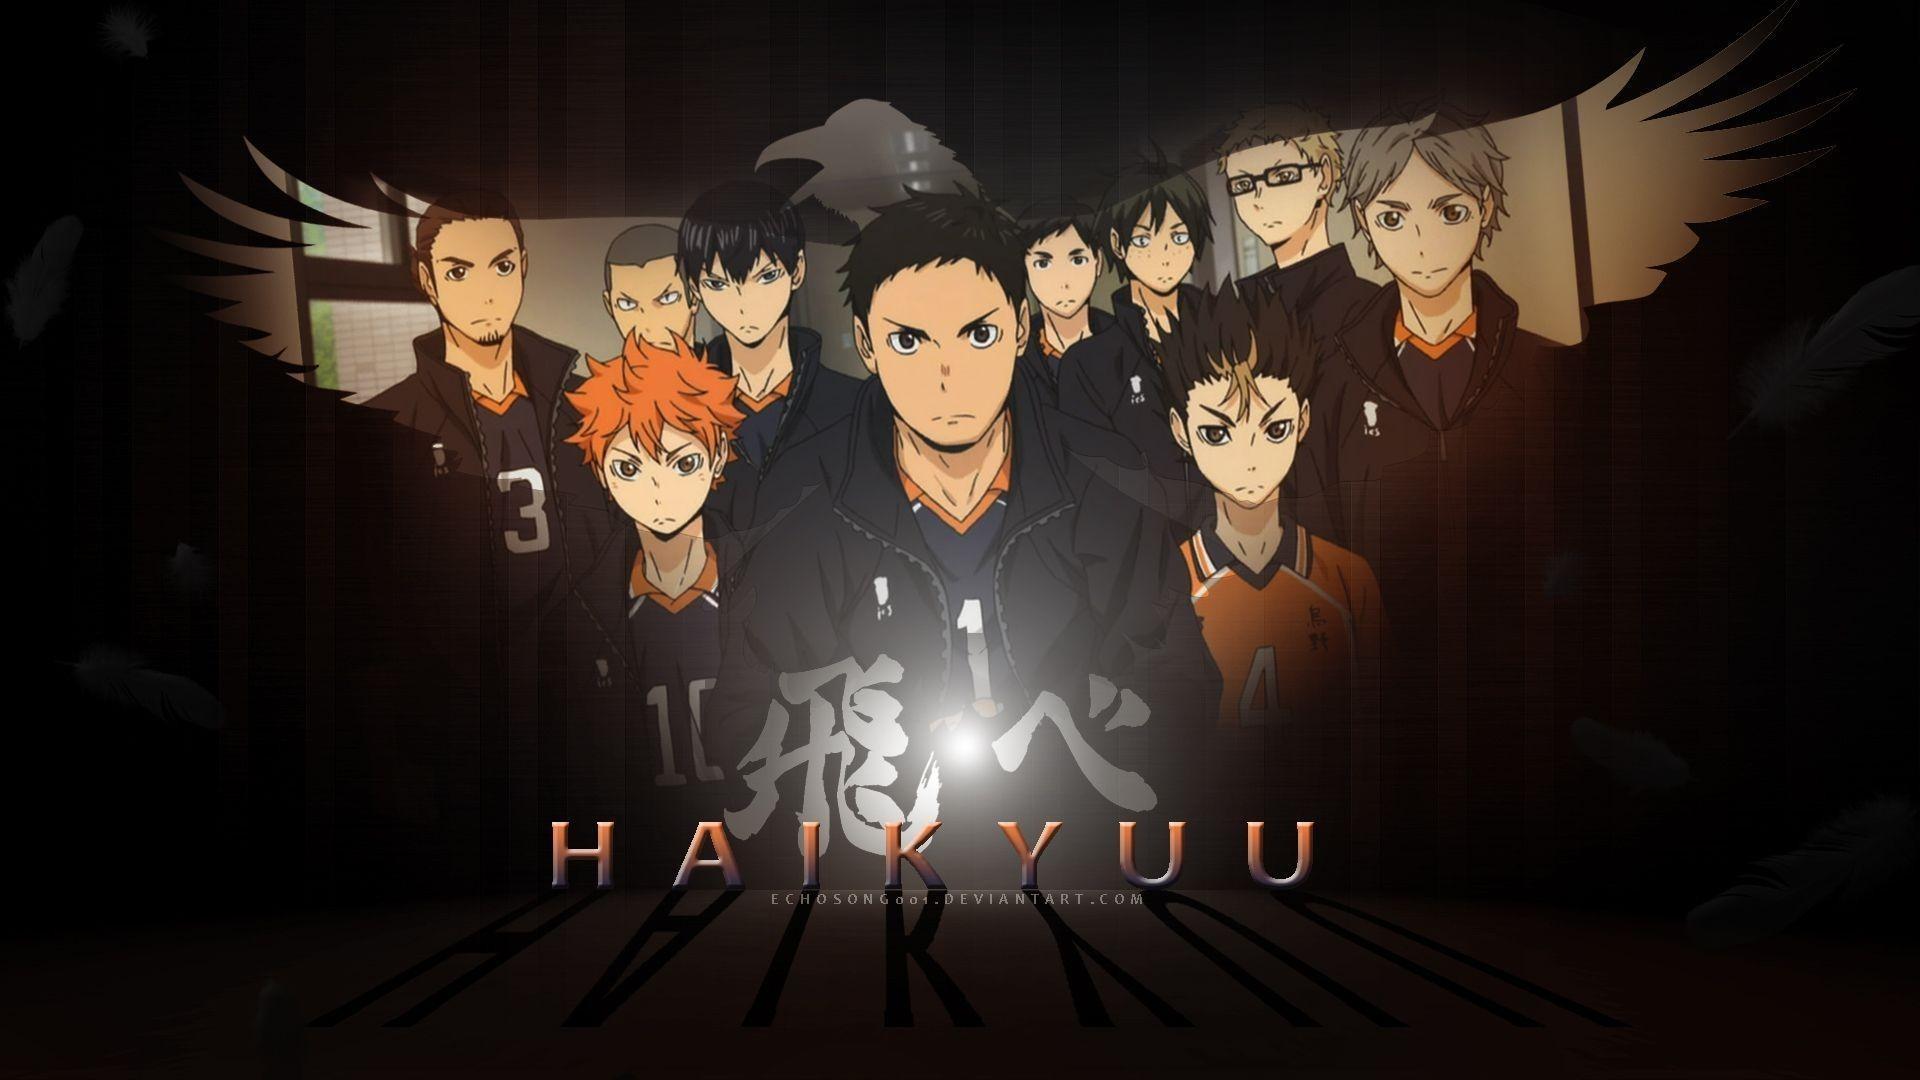 Haikyuu hd wallpaper download